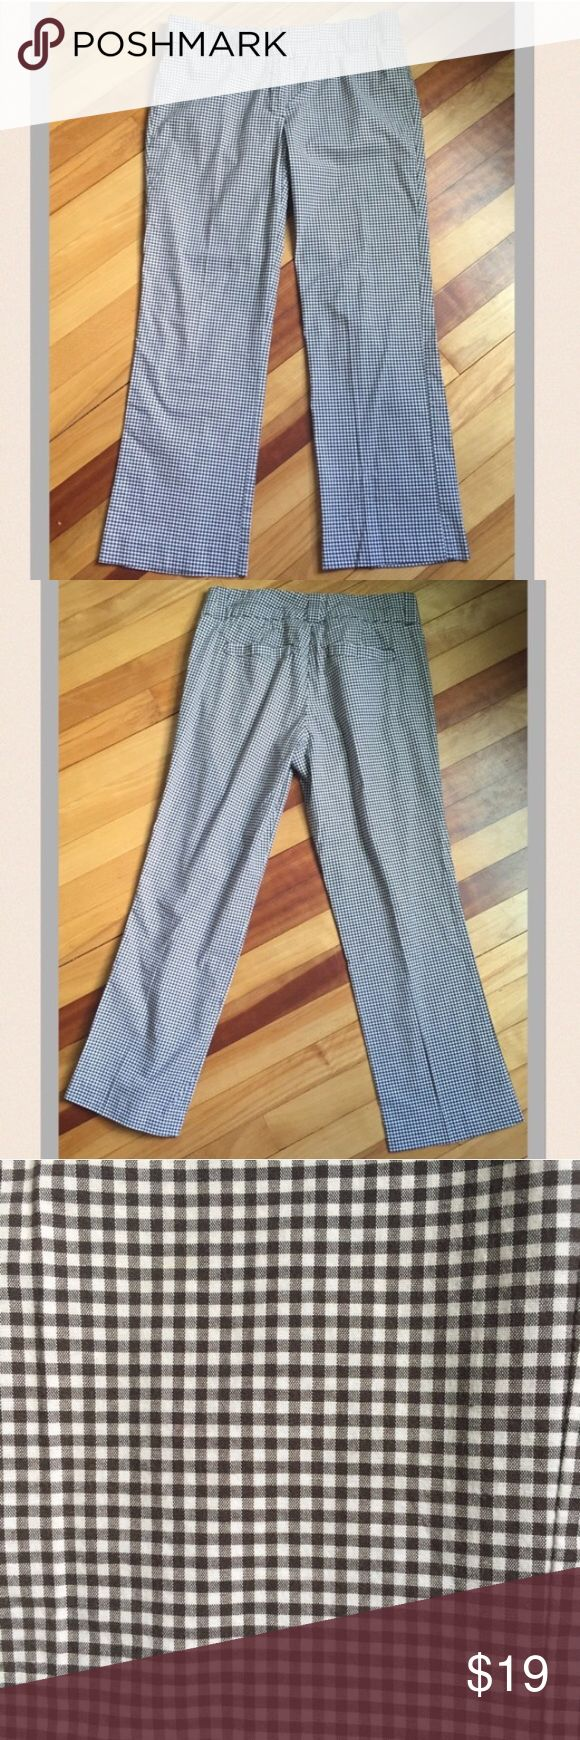 Selling this Jennifer Reale Design Checkered Trouser Pants on Poshmark! My username is: davias_closet. #shopmycloset #poshmark #fashion #shopping #style #forsale #Jennifer Reale Design #Pants